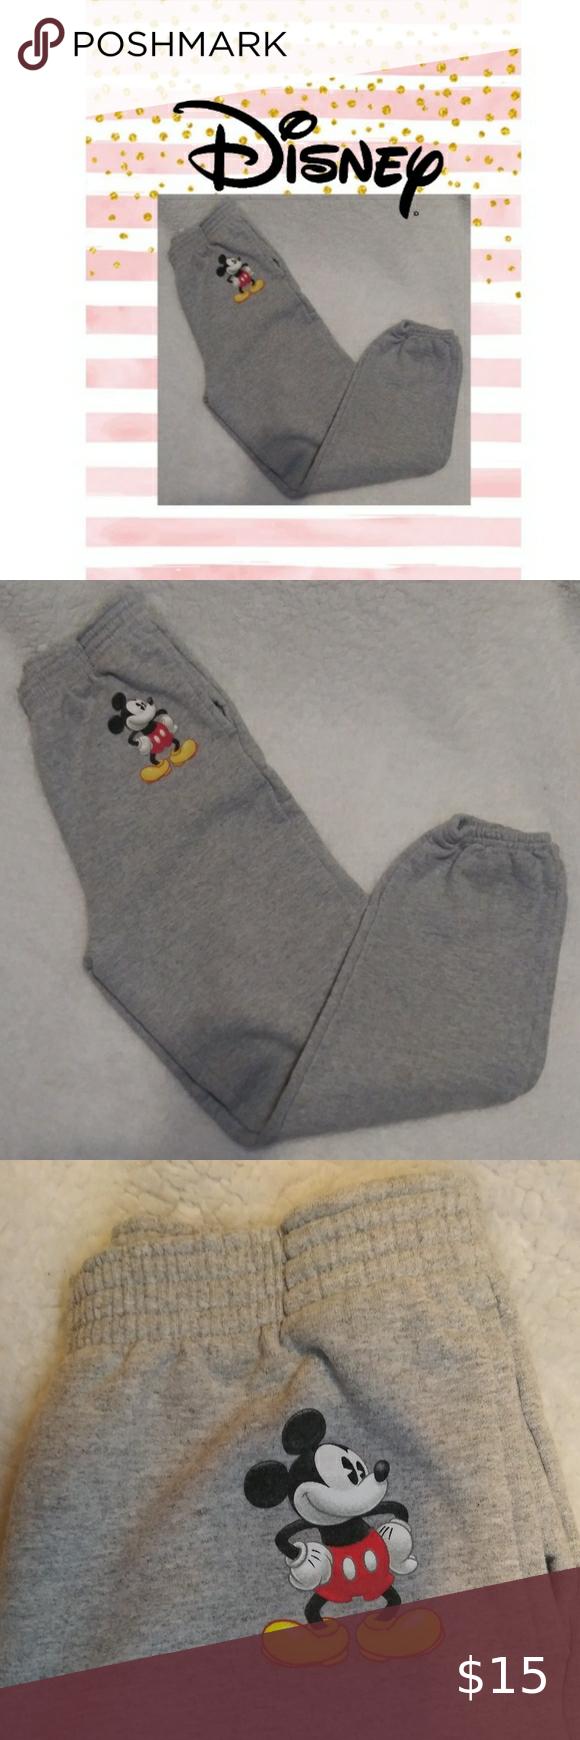 Disney Mickey Mouse Fleece Half-Zip Sweater Jacket /& Jogger Pants Set